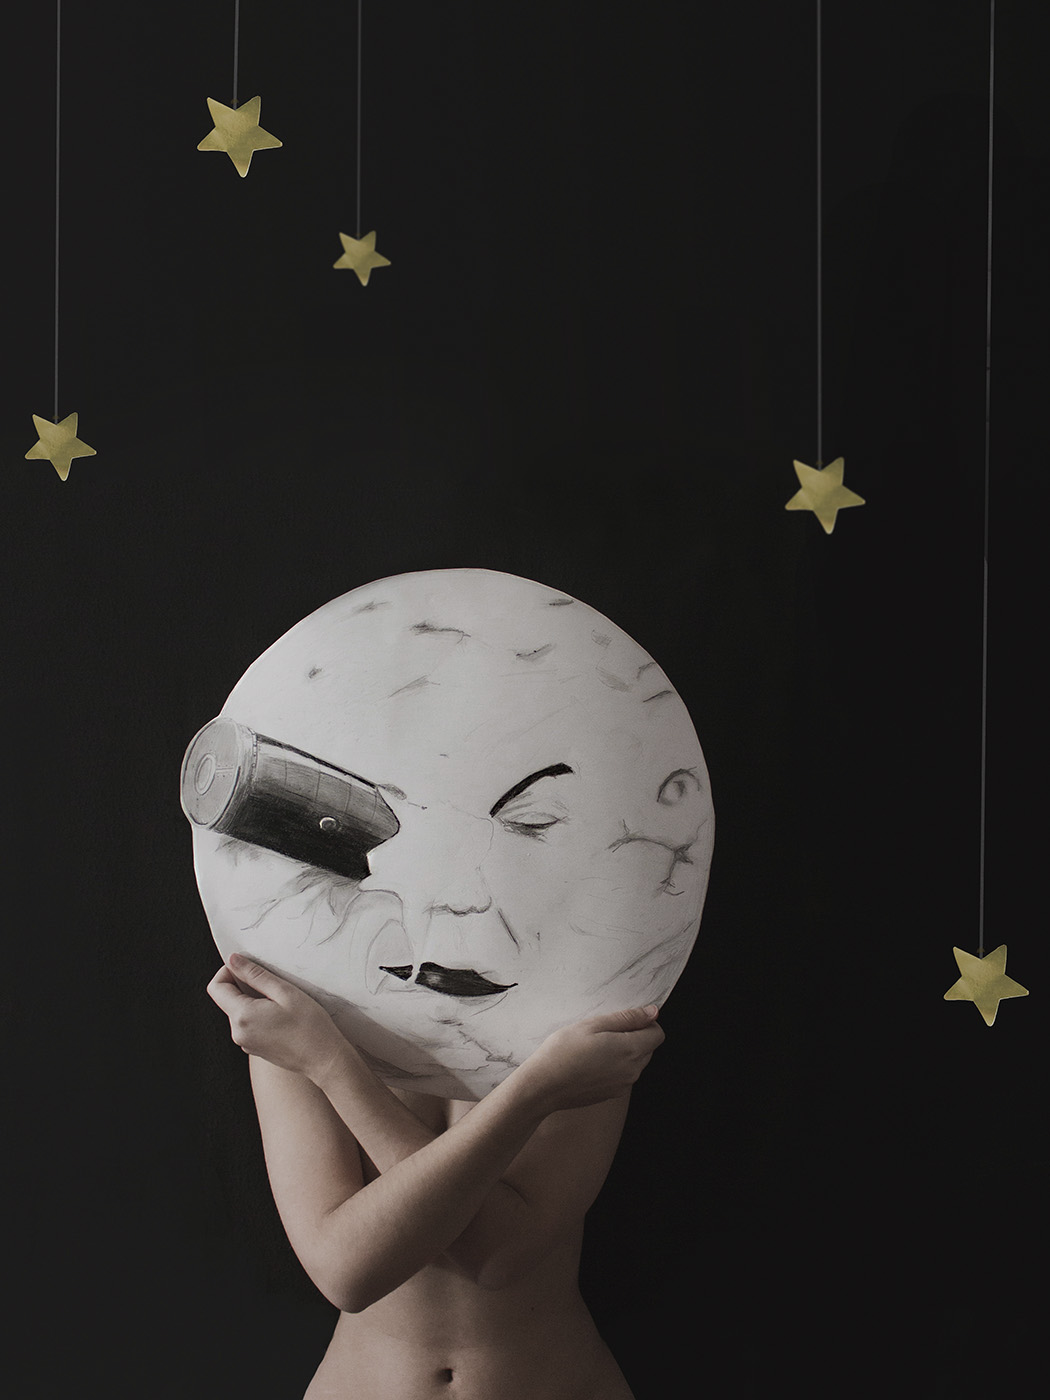 La Luna se cansó de viajeros (Elena Rocío Jiménez Rodríguez)